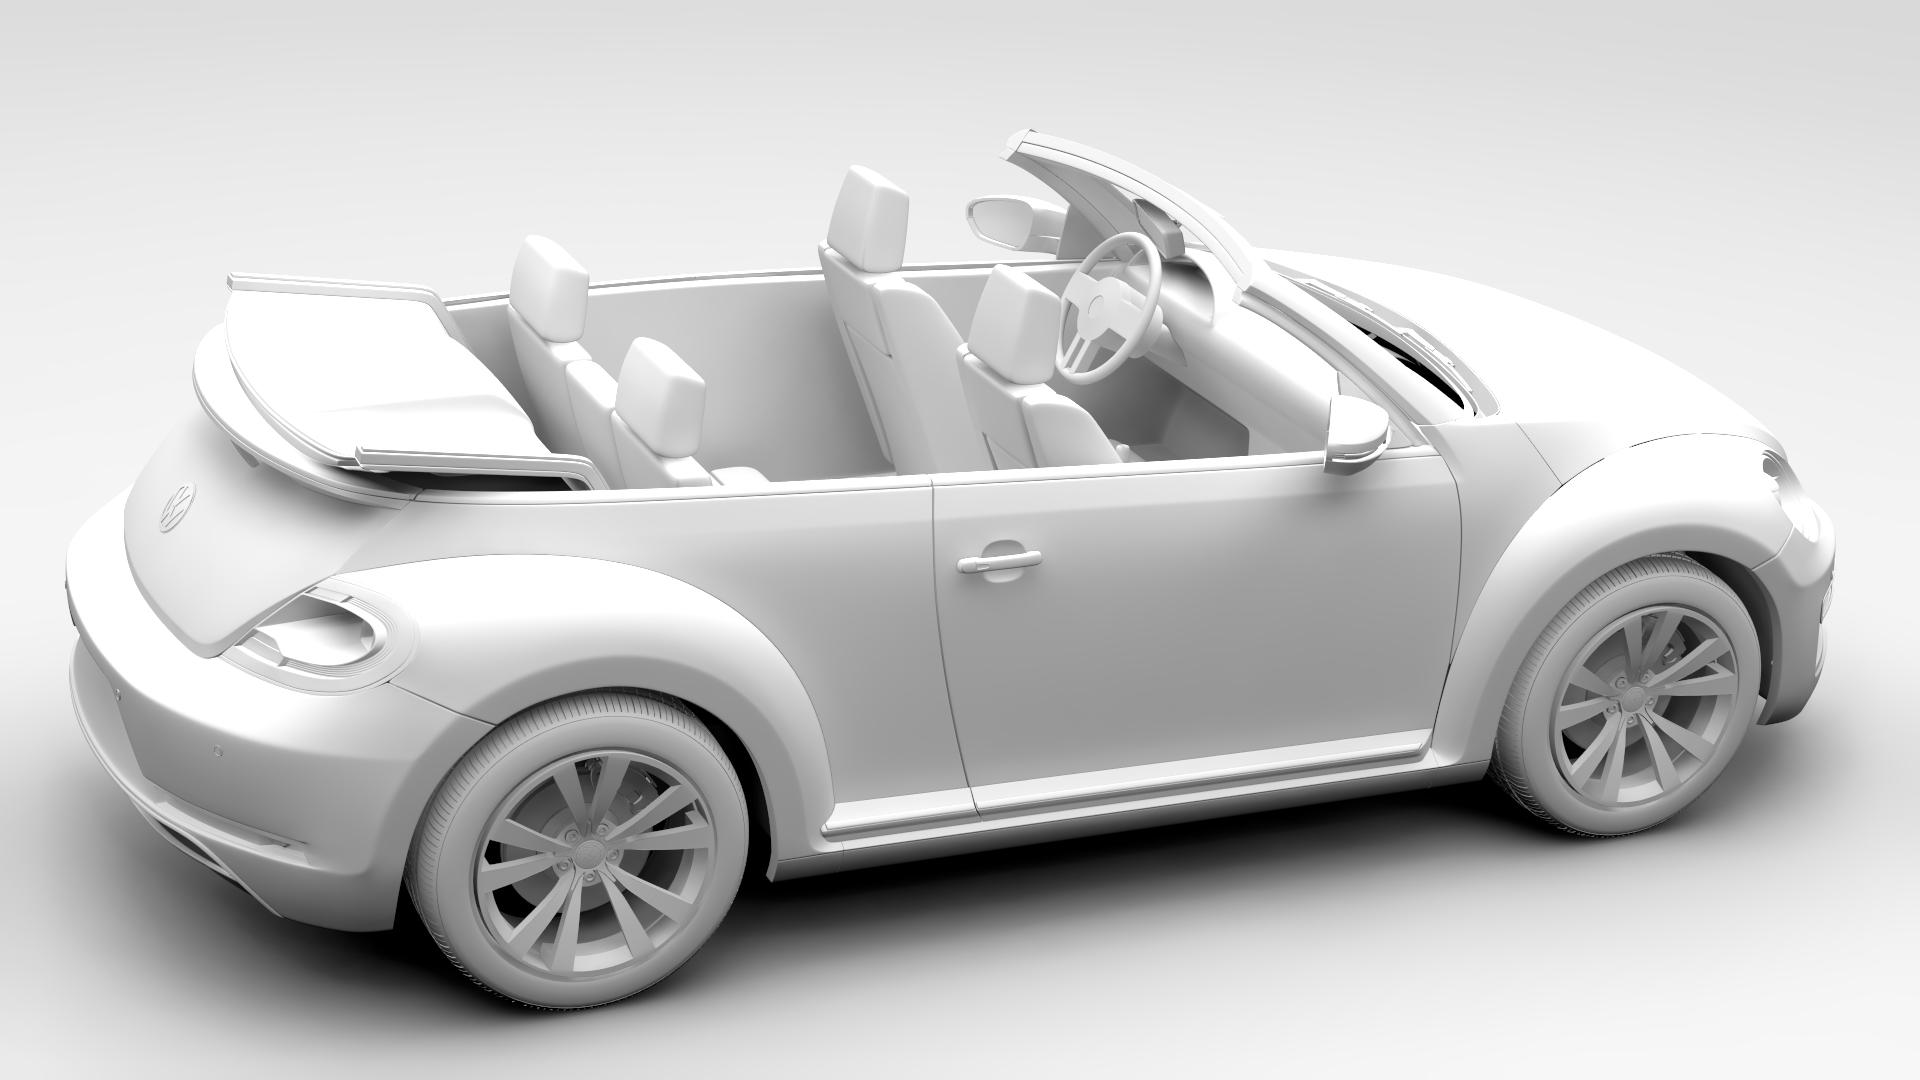 vw beetle cabriolet 2017 3d model 3ds max fbx c4d lwo ma mb hrc xsi obj 221605